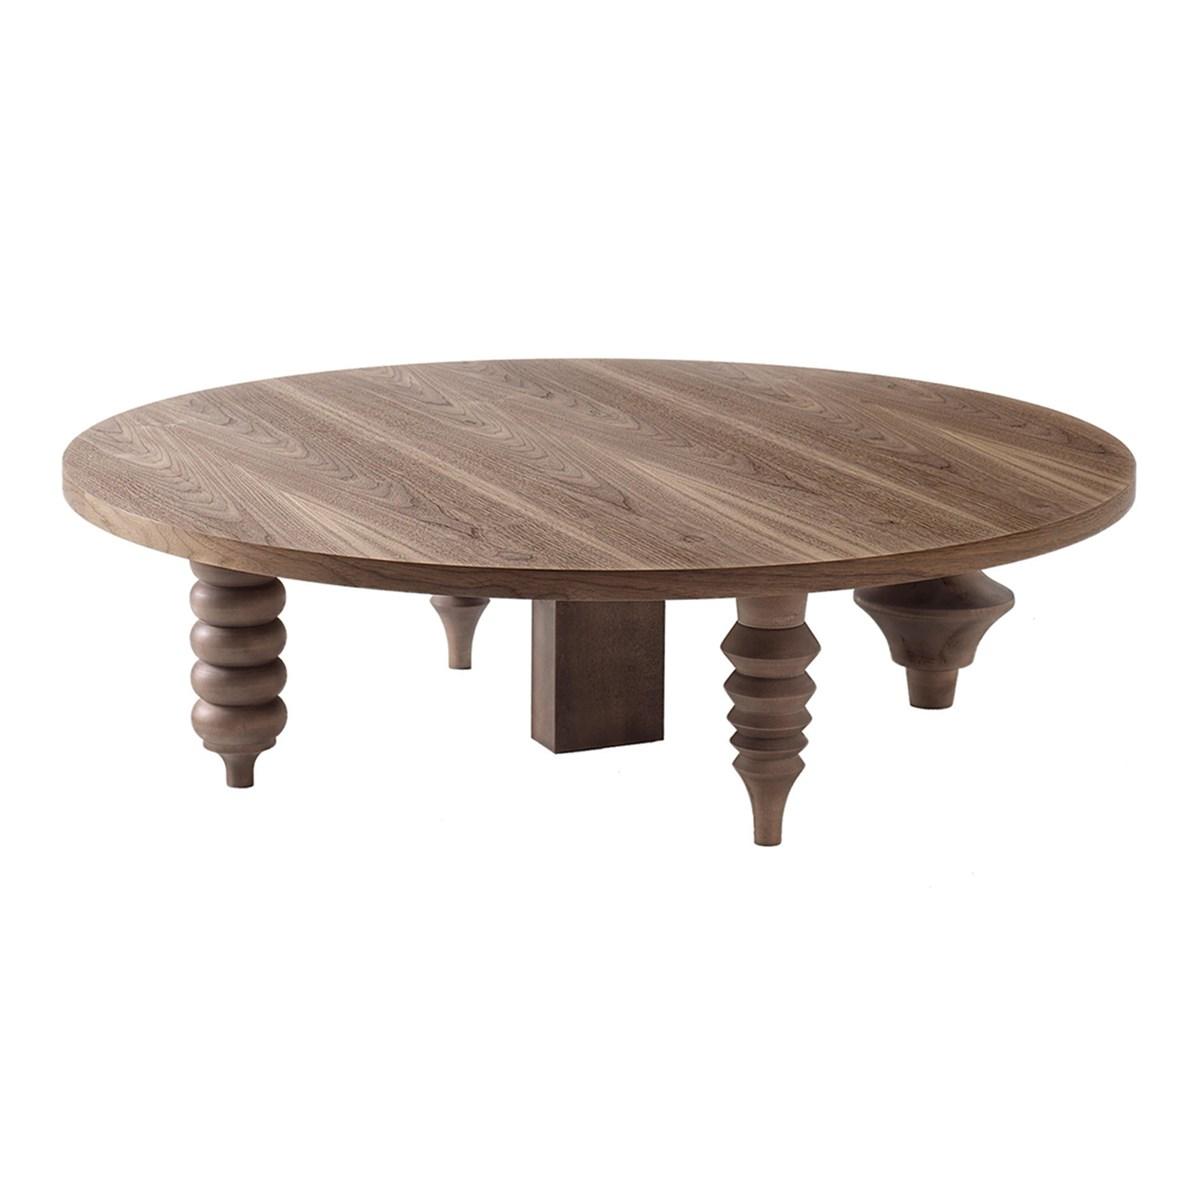 BD-Barcelona-Jaime-Hayon-Multileg-Low-Table-Matisse-1